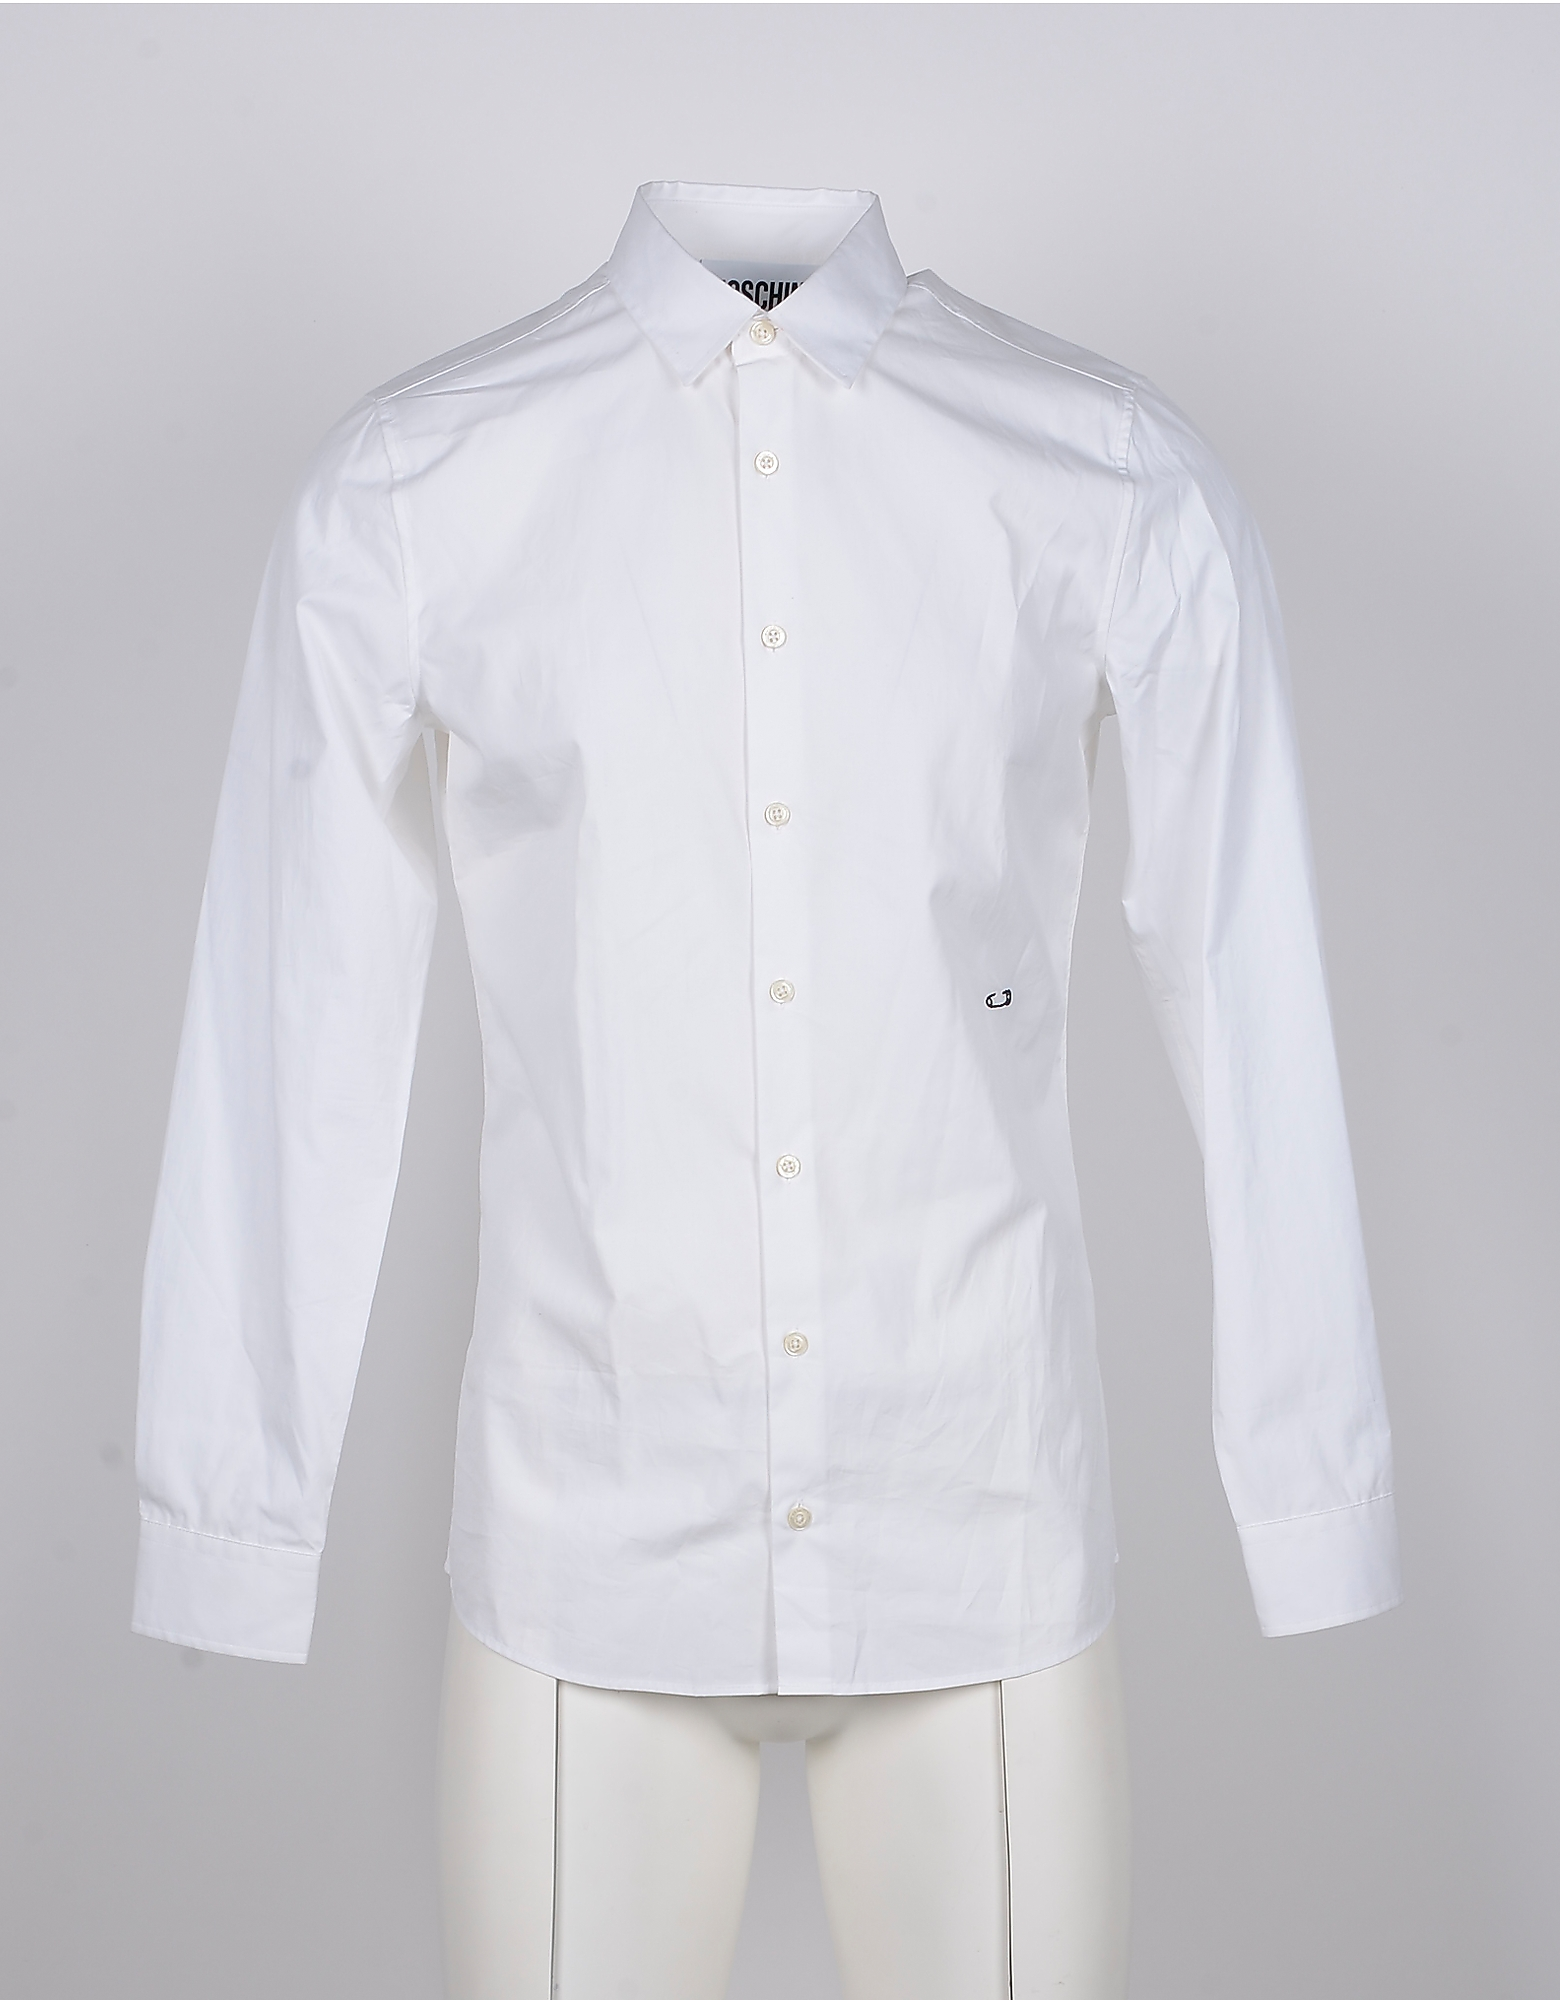 Moschino Designer Shirts, Safety Pin Embroidered White Cotton Men's Dress Shirt